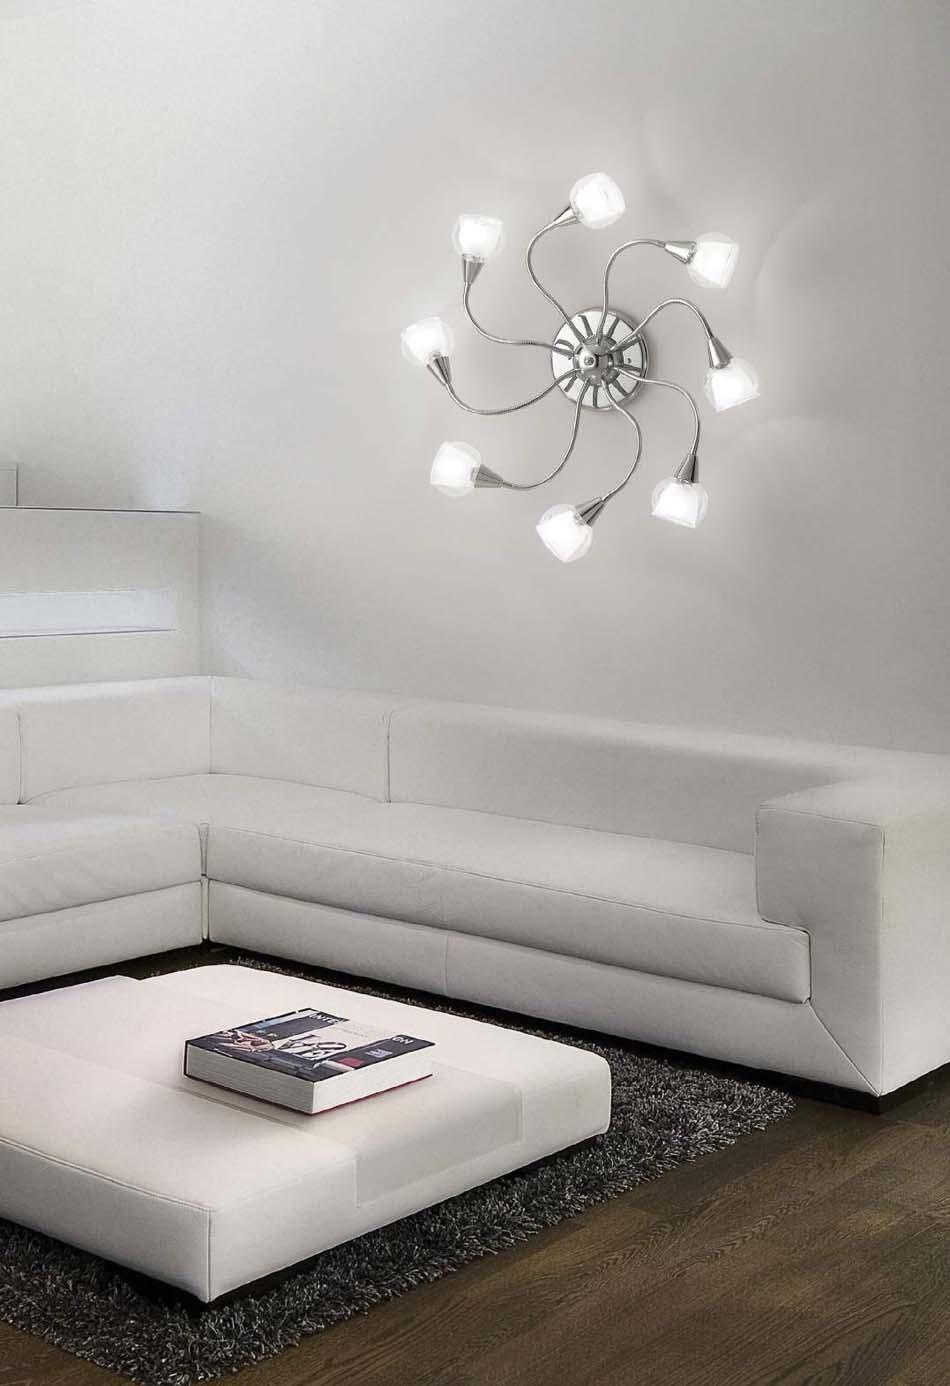 Lampade 47 parete soffitto Ideal Lux Tender – Bruni Arredamenti